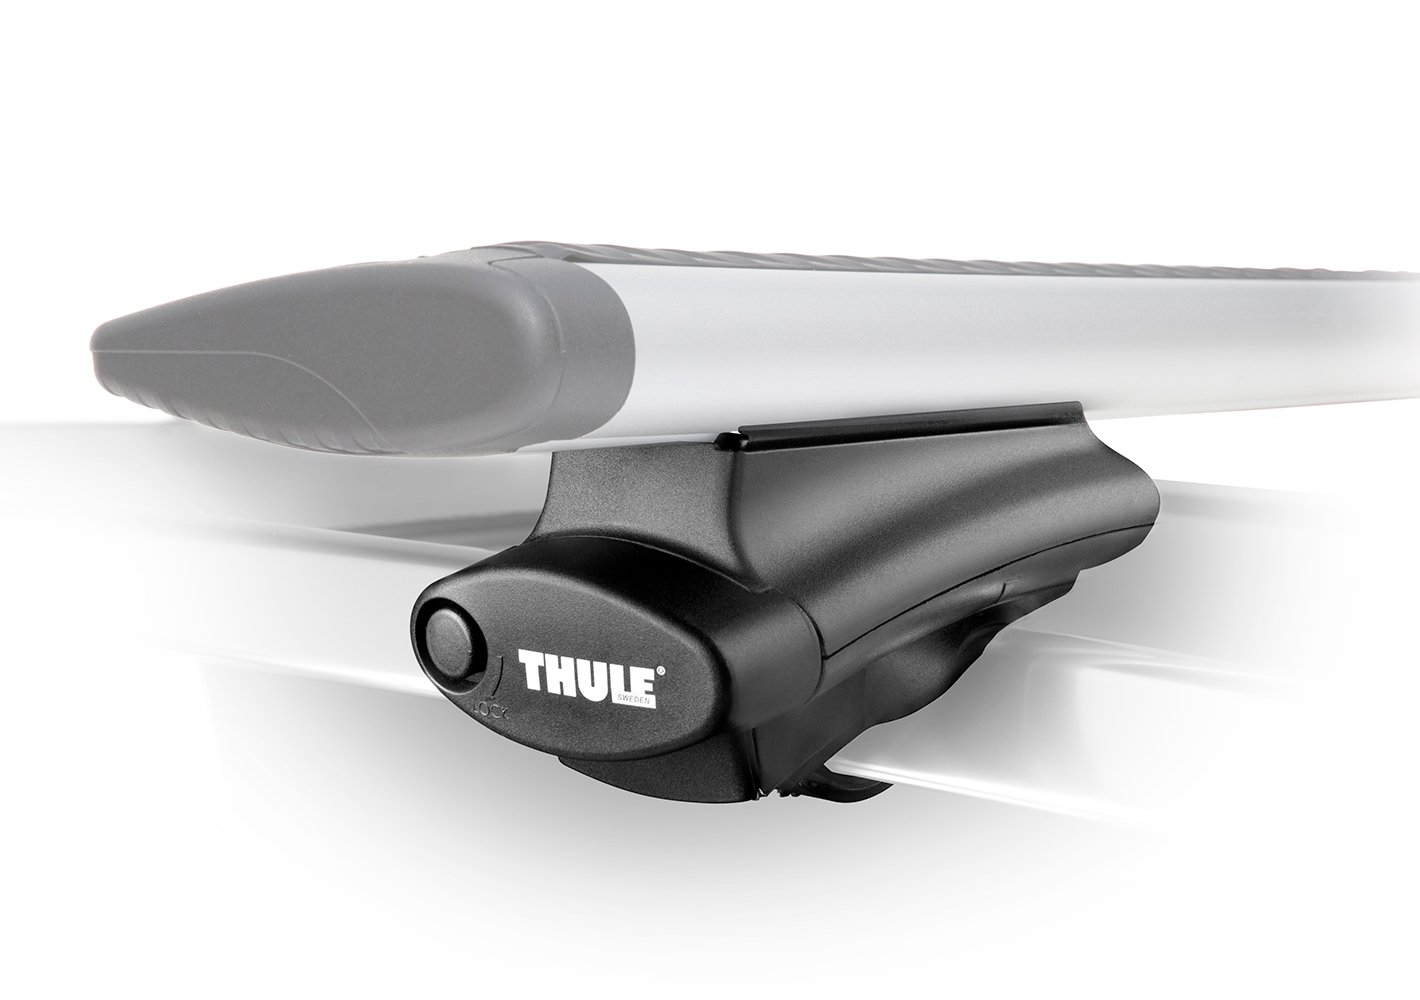 thule 45050. Black Bedroom Furniture Sets. Home Design Ideas